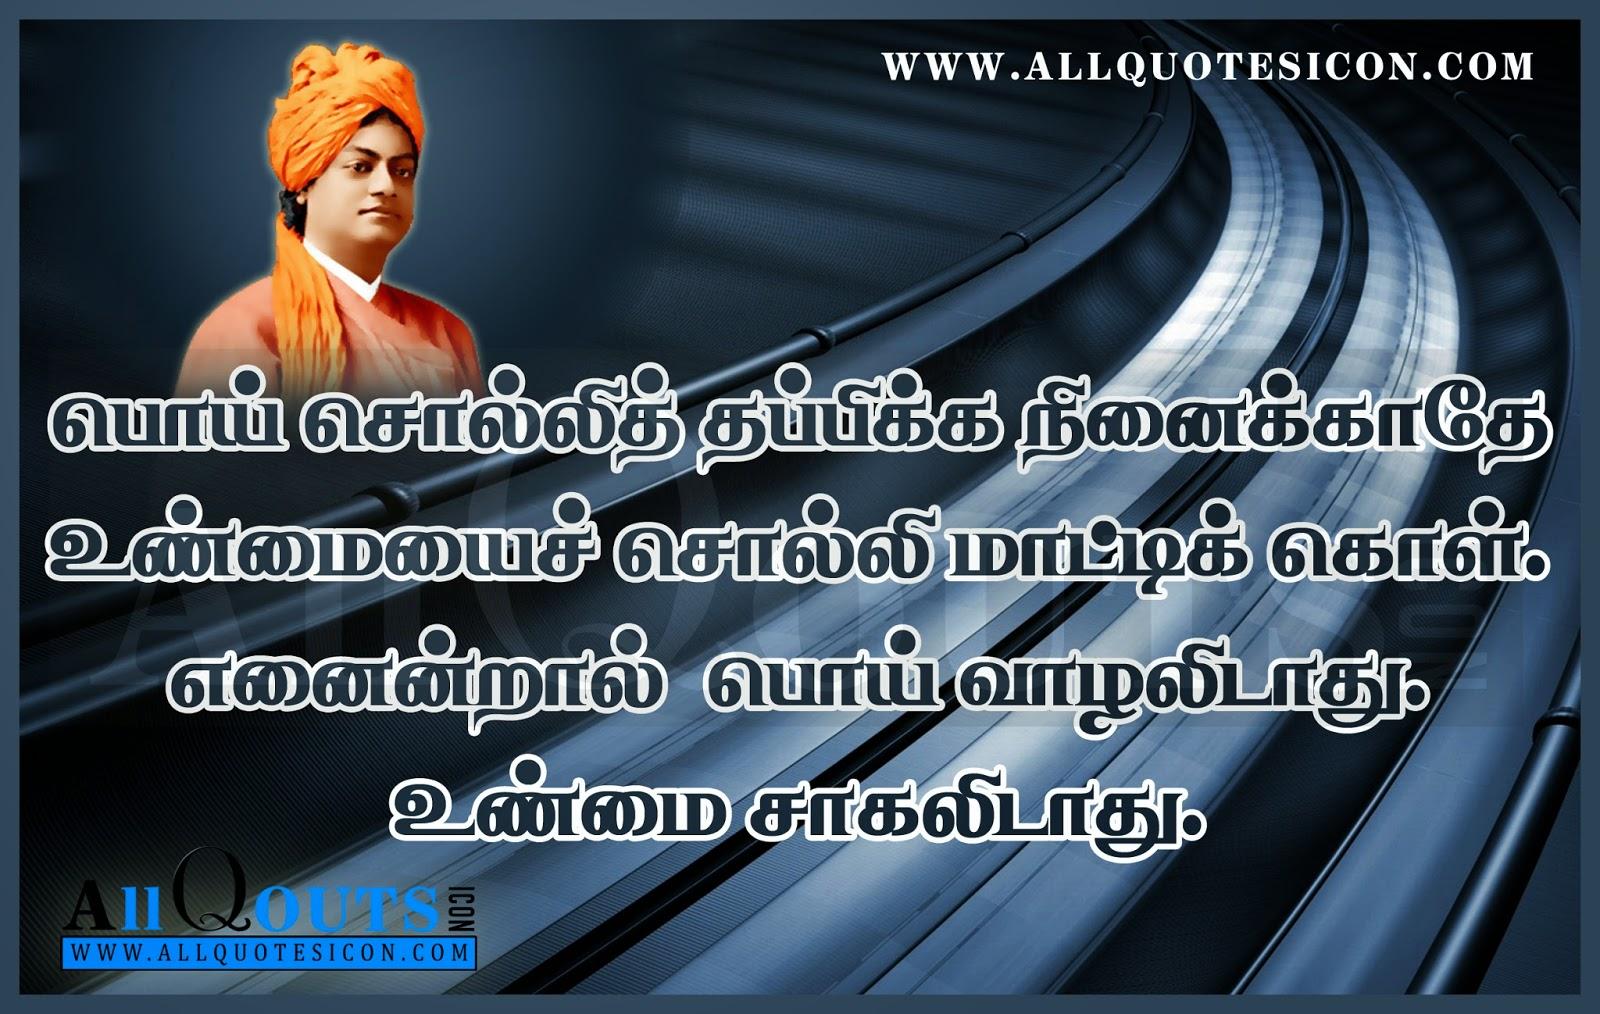 quotes by swami vivekananda quotesgram vivekananda quotes